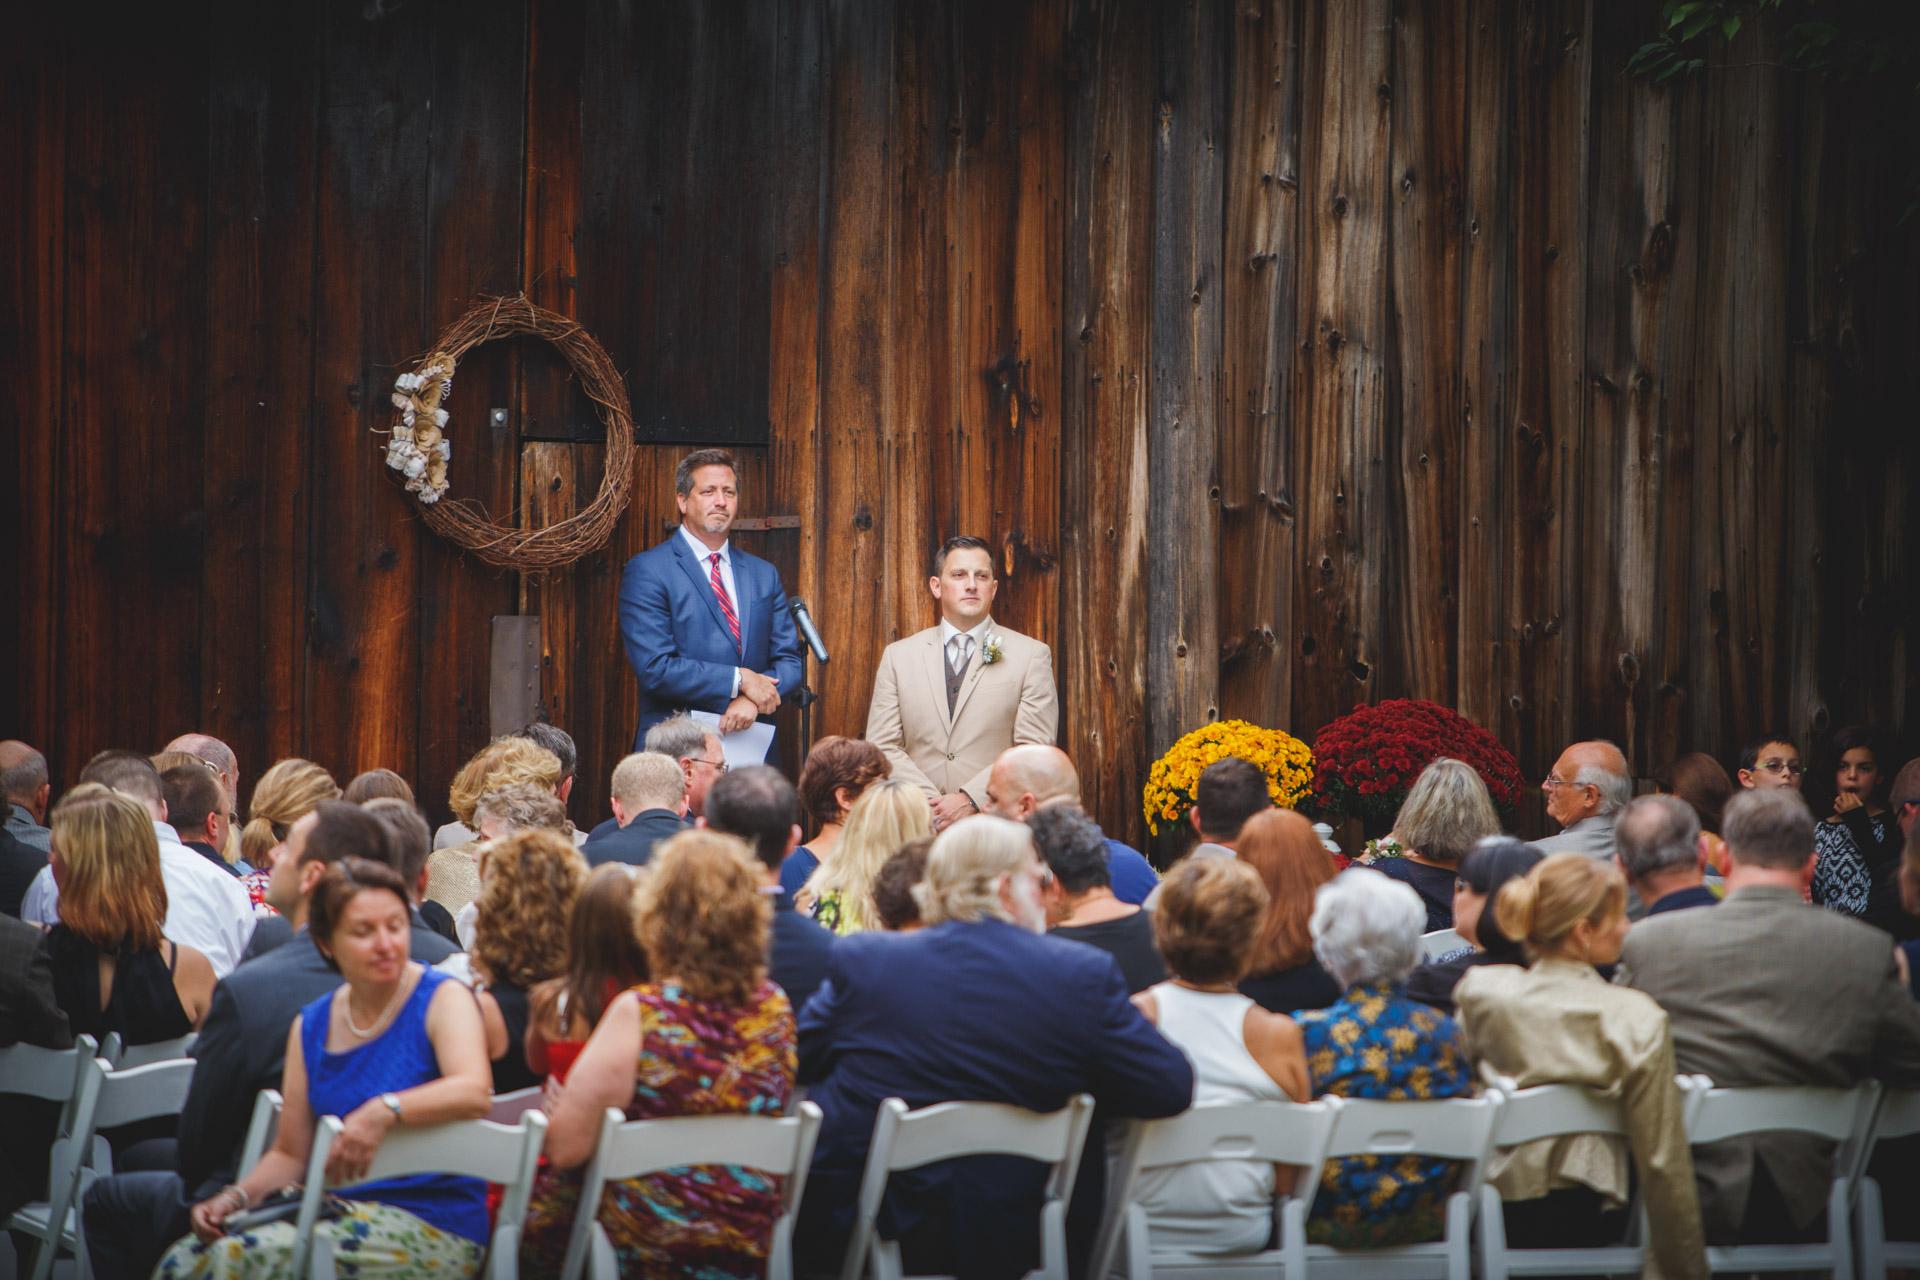 Wedding Photos at Webb Barn Wethersfield -14.jpg